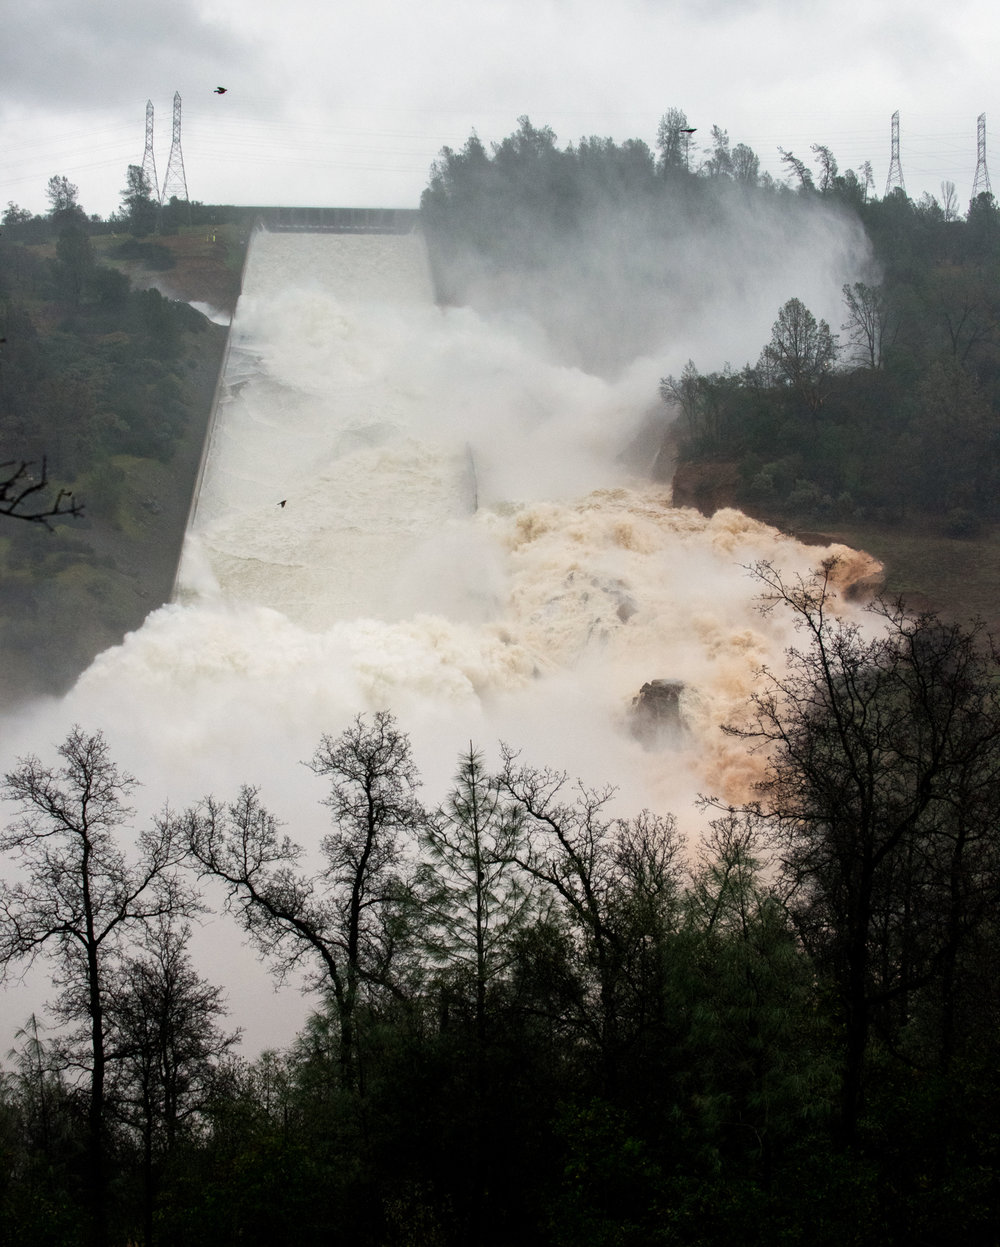 Oroville Dam 55,000 CFS